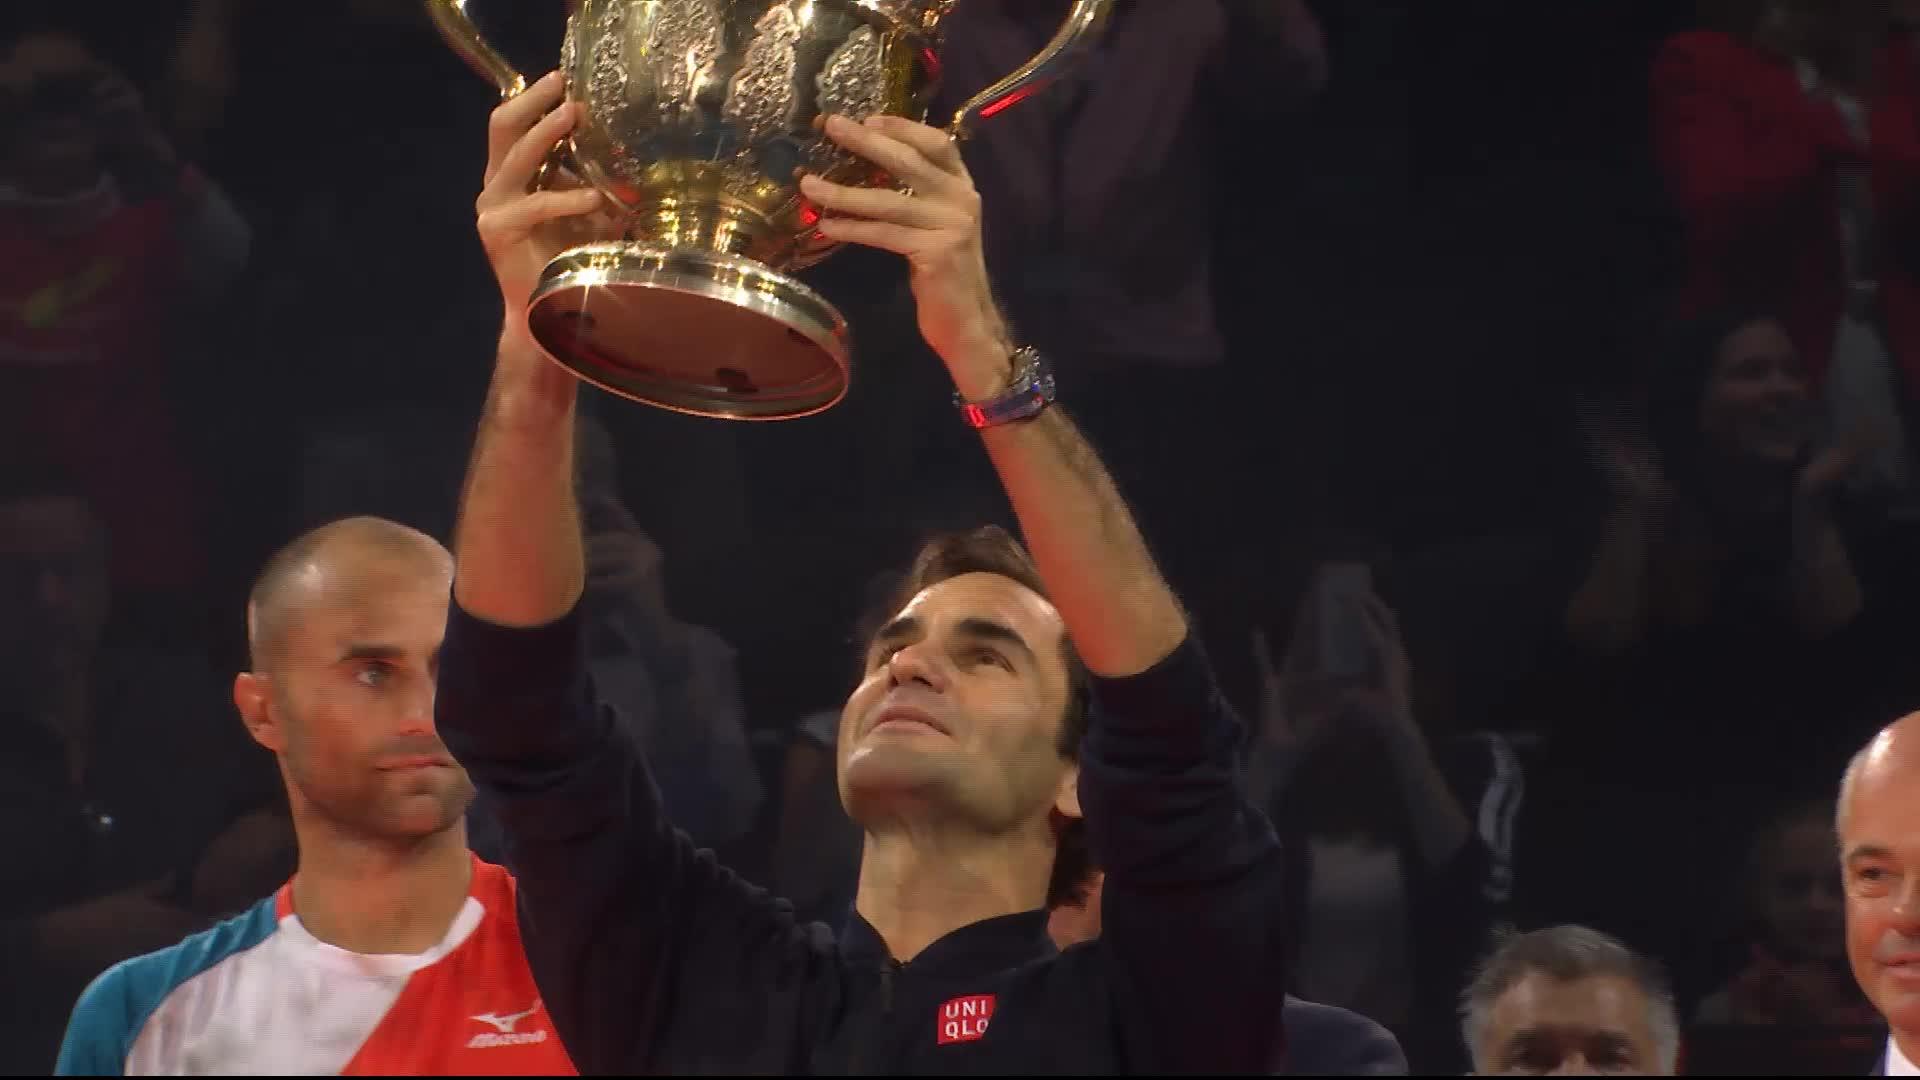 Roger Federer remporte son 99e titre